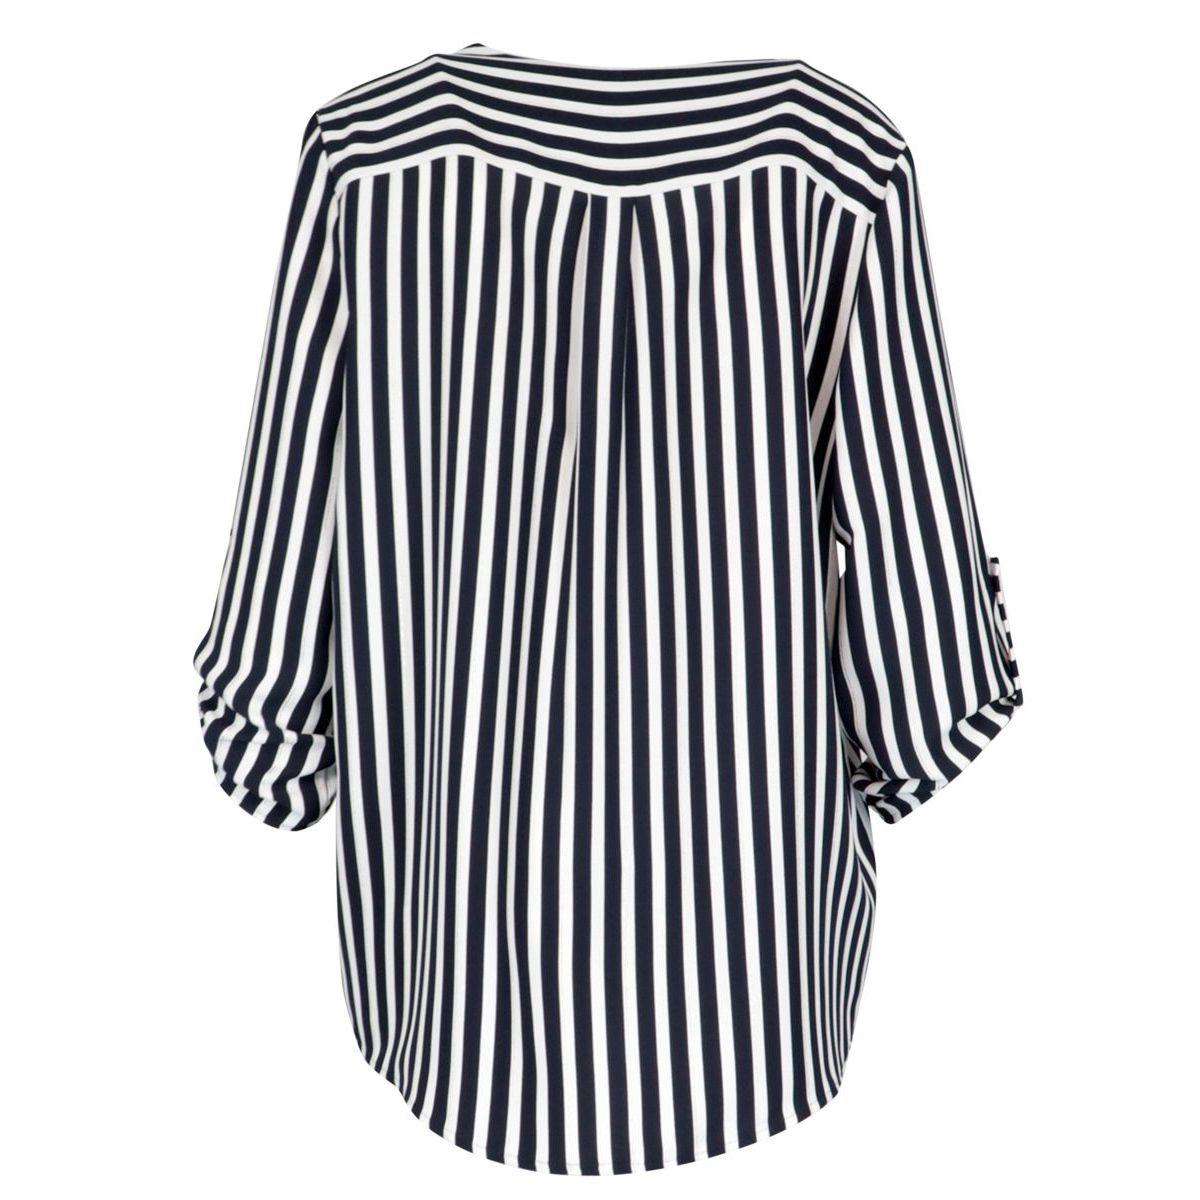 Striped polyester shirt White / blue Joseph Ribkoff